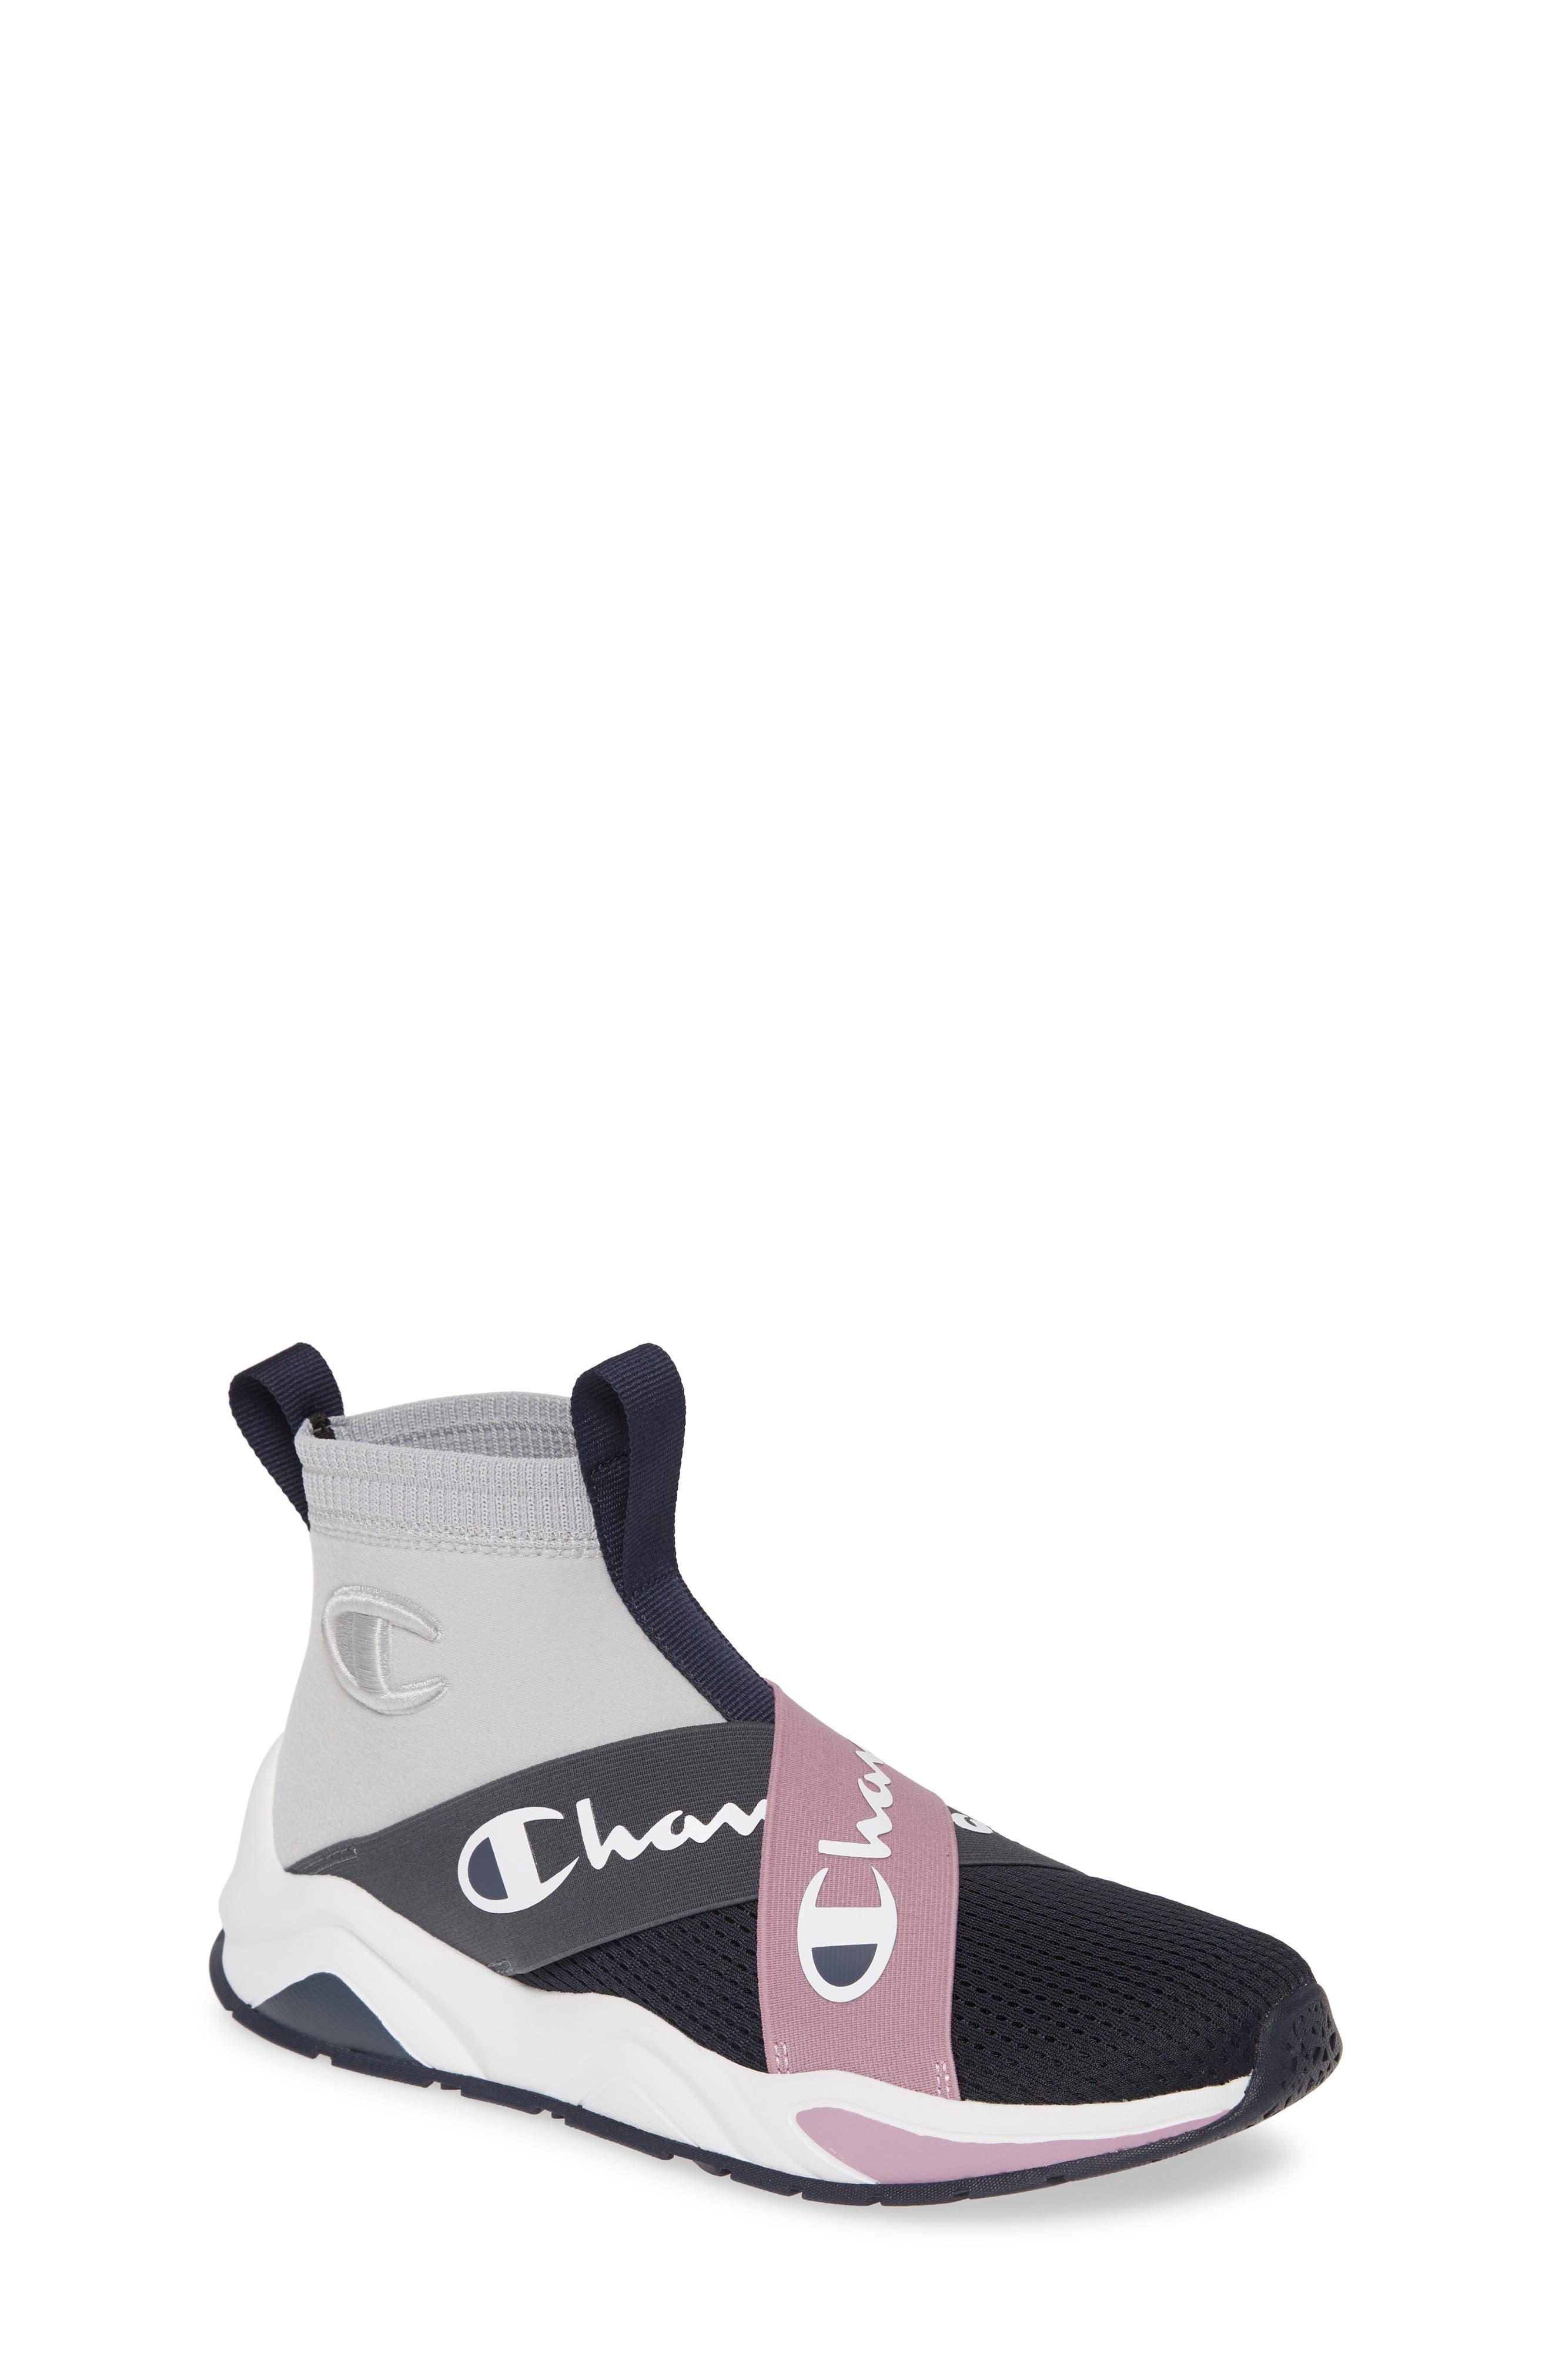 Girls\u0027 Champion Sneakers, Tennis Shoes \u0026 Basketball Shoes